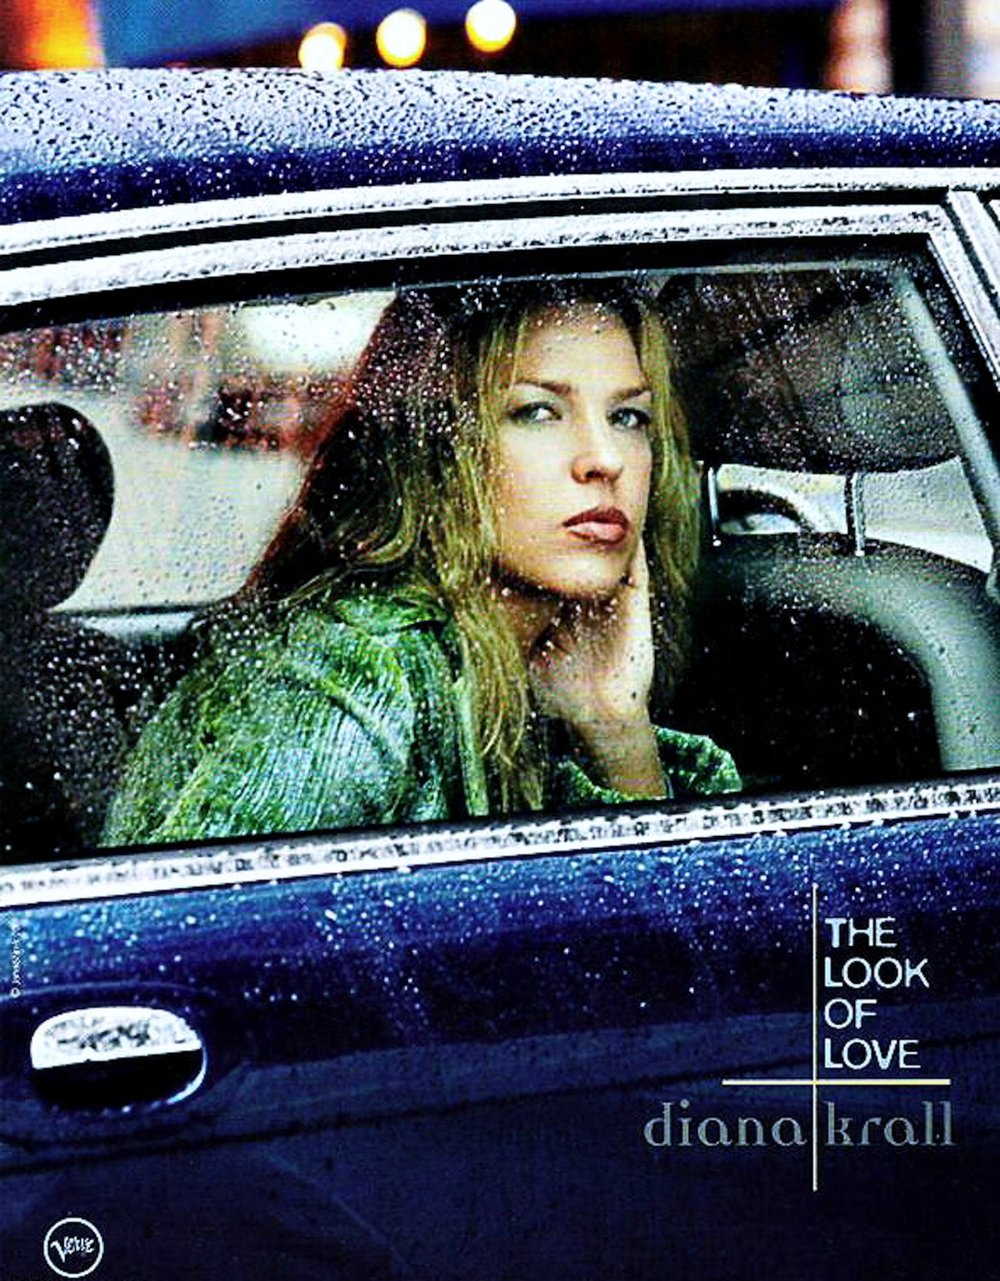 Diana Krall The Look of Love ph Jane Shirek.jpg